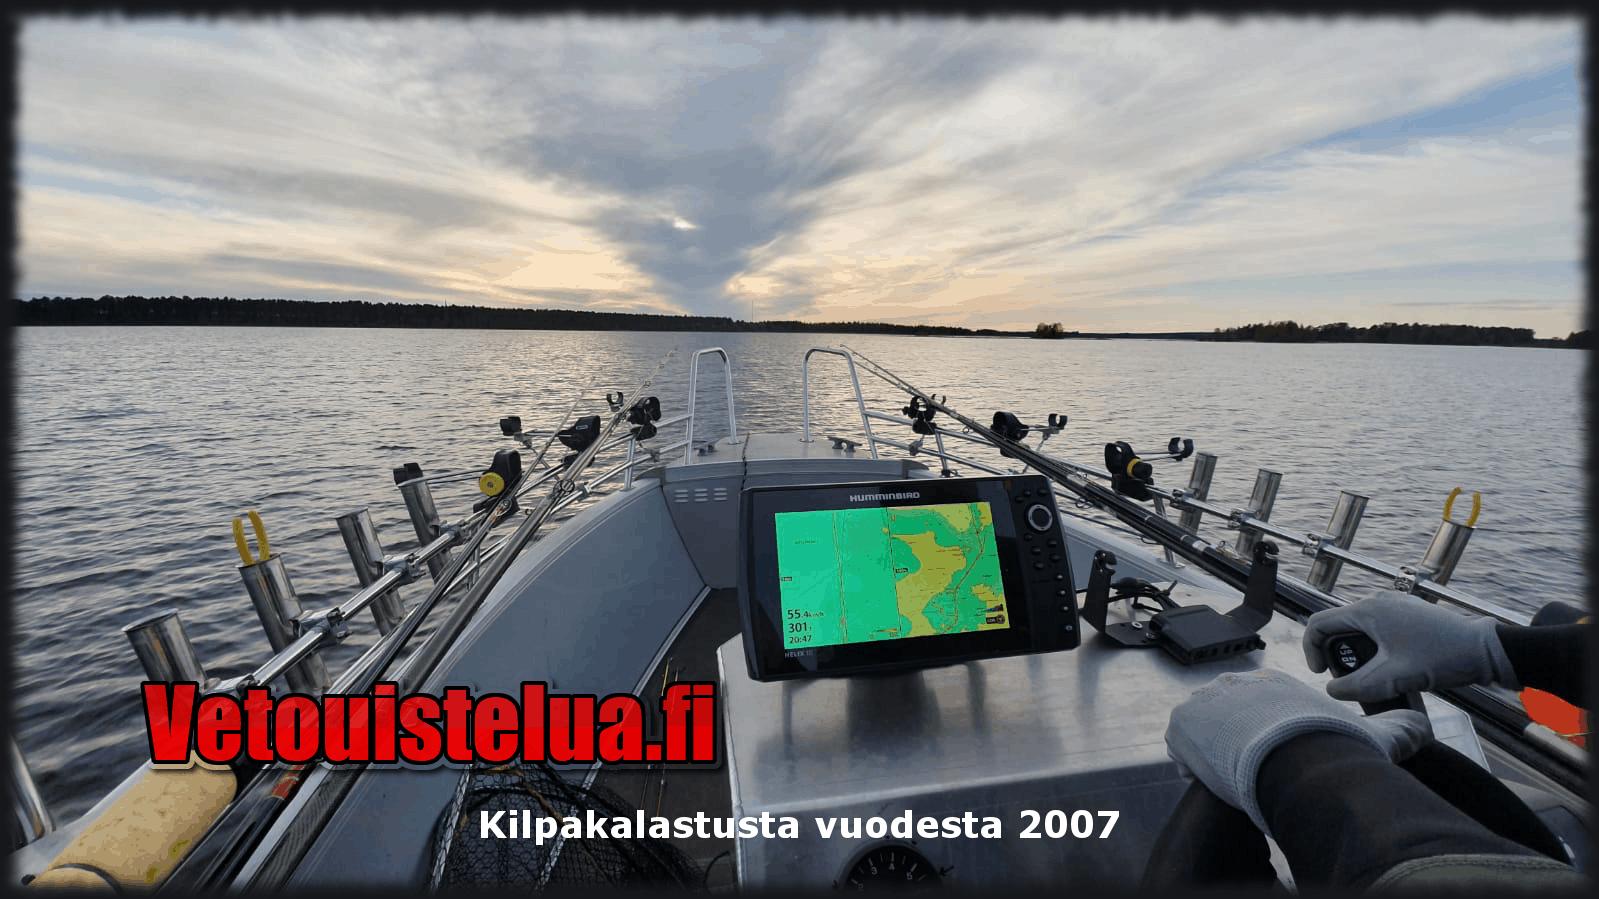 Vetouistelua.fi